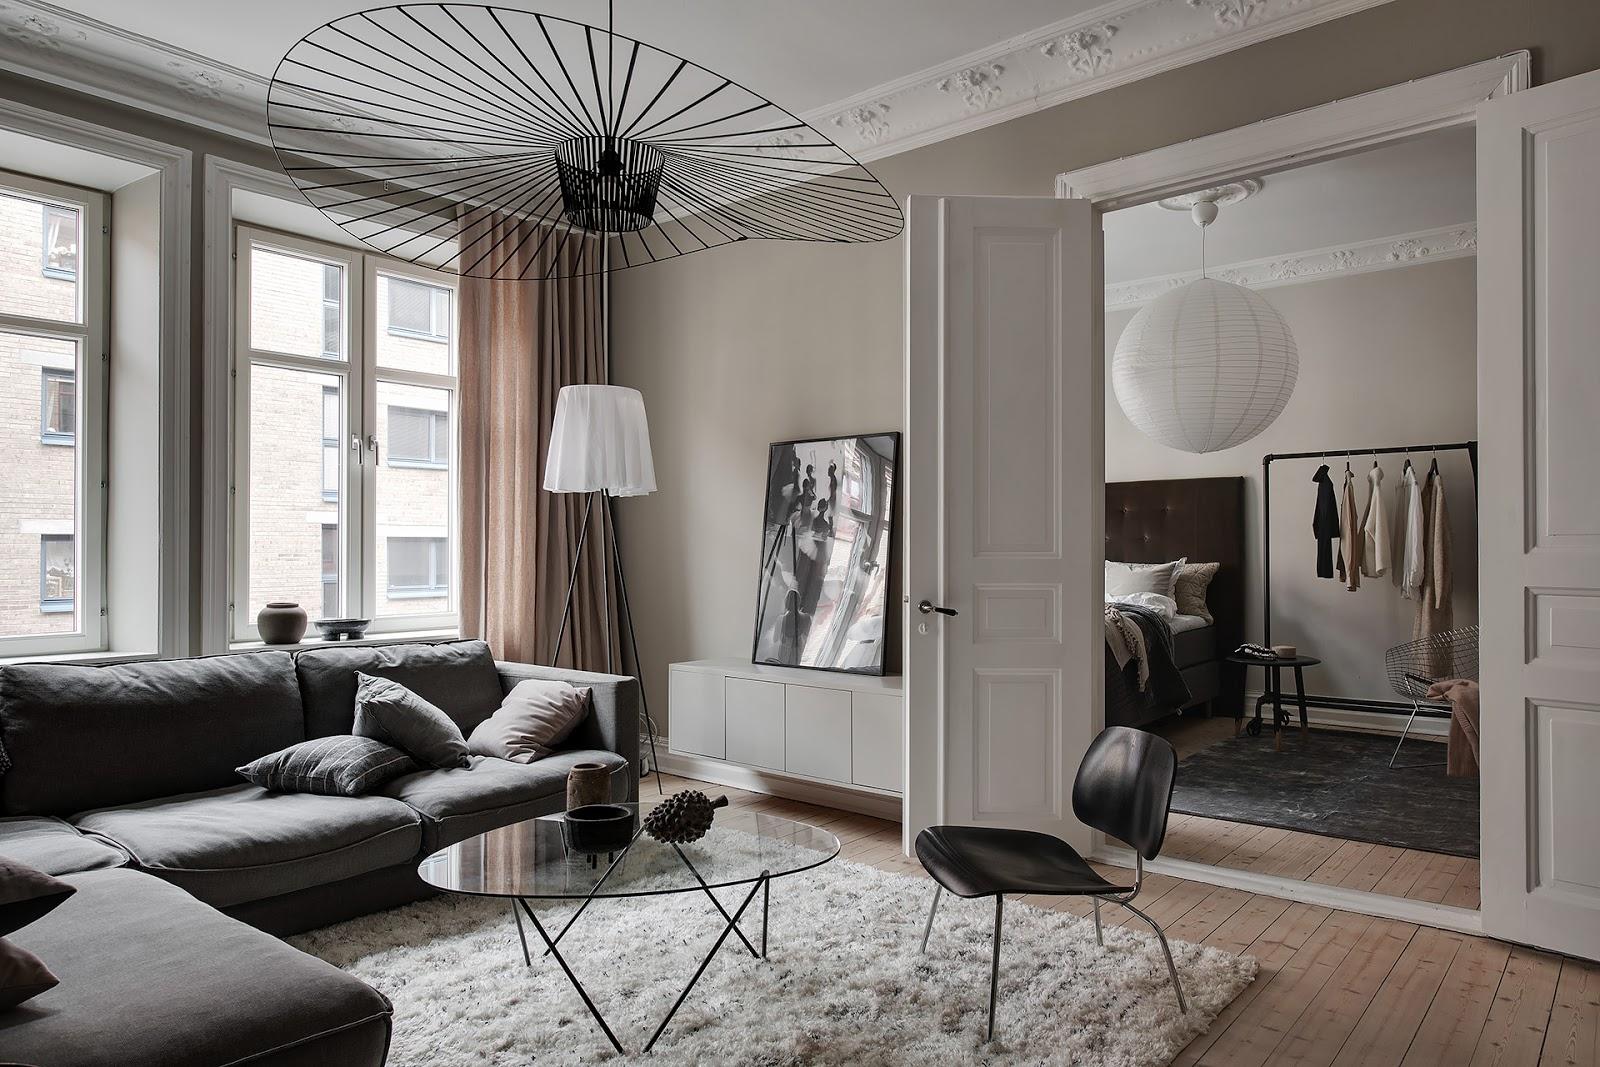 Appartamento scandinavo in grigio beige arc art blog by for Grigio e beige arredamento